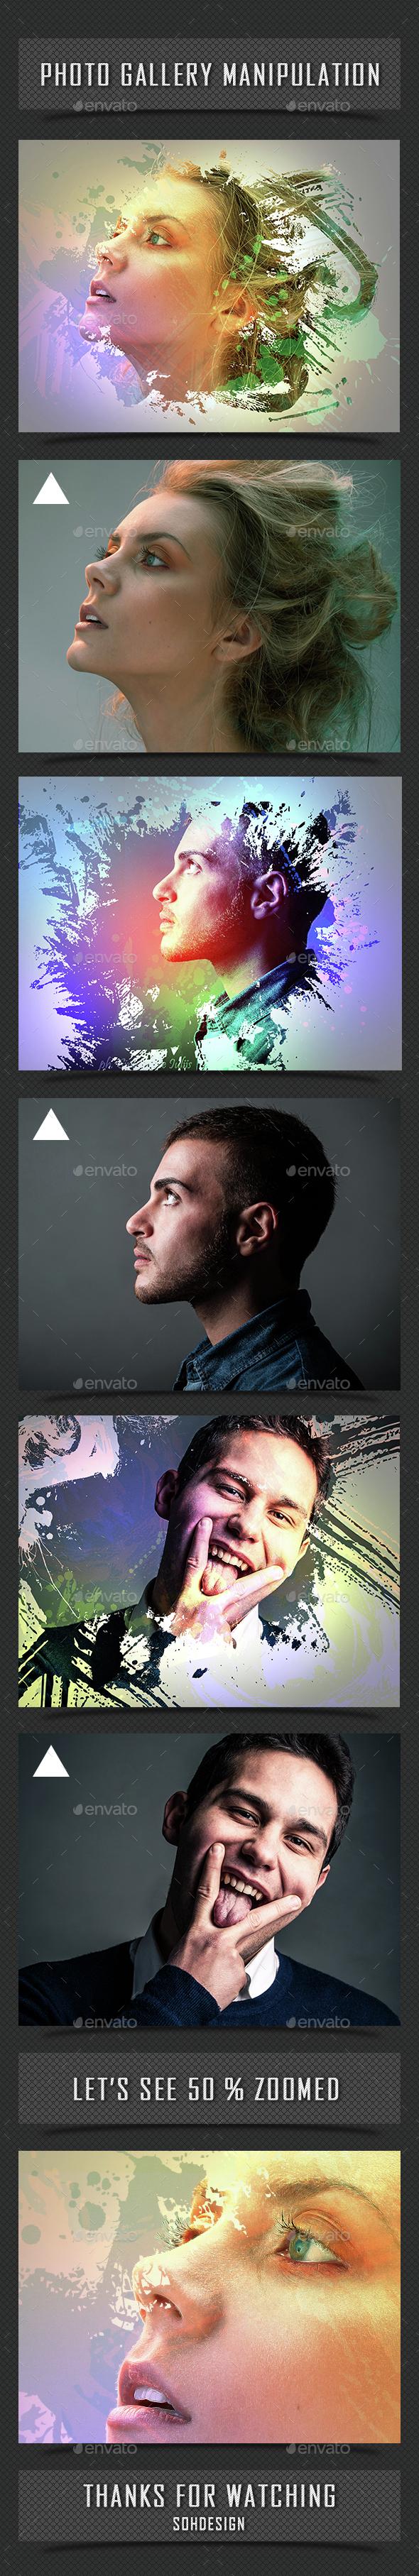 Photo Gallery Manipulation - Graphics